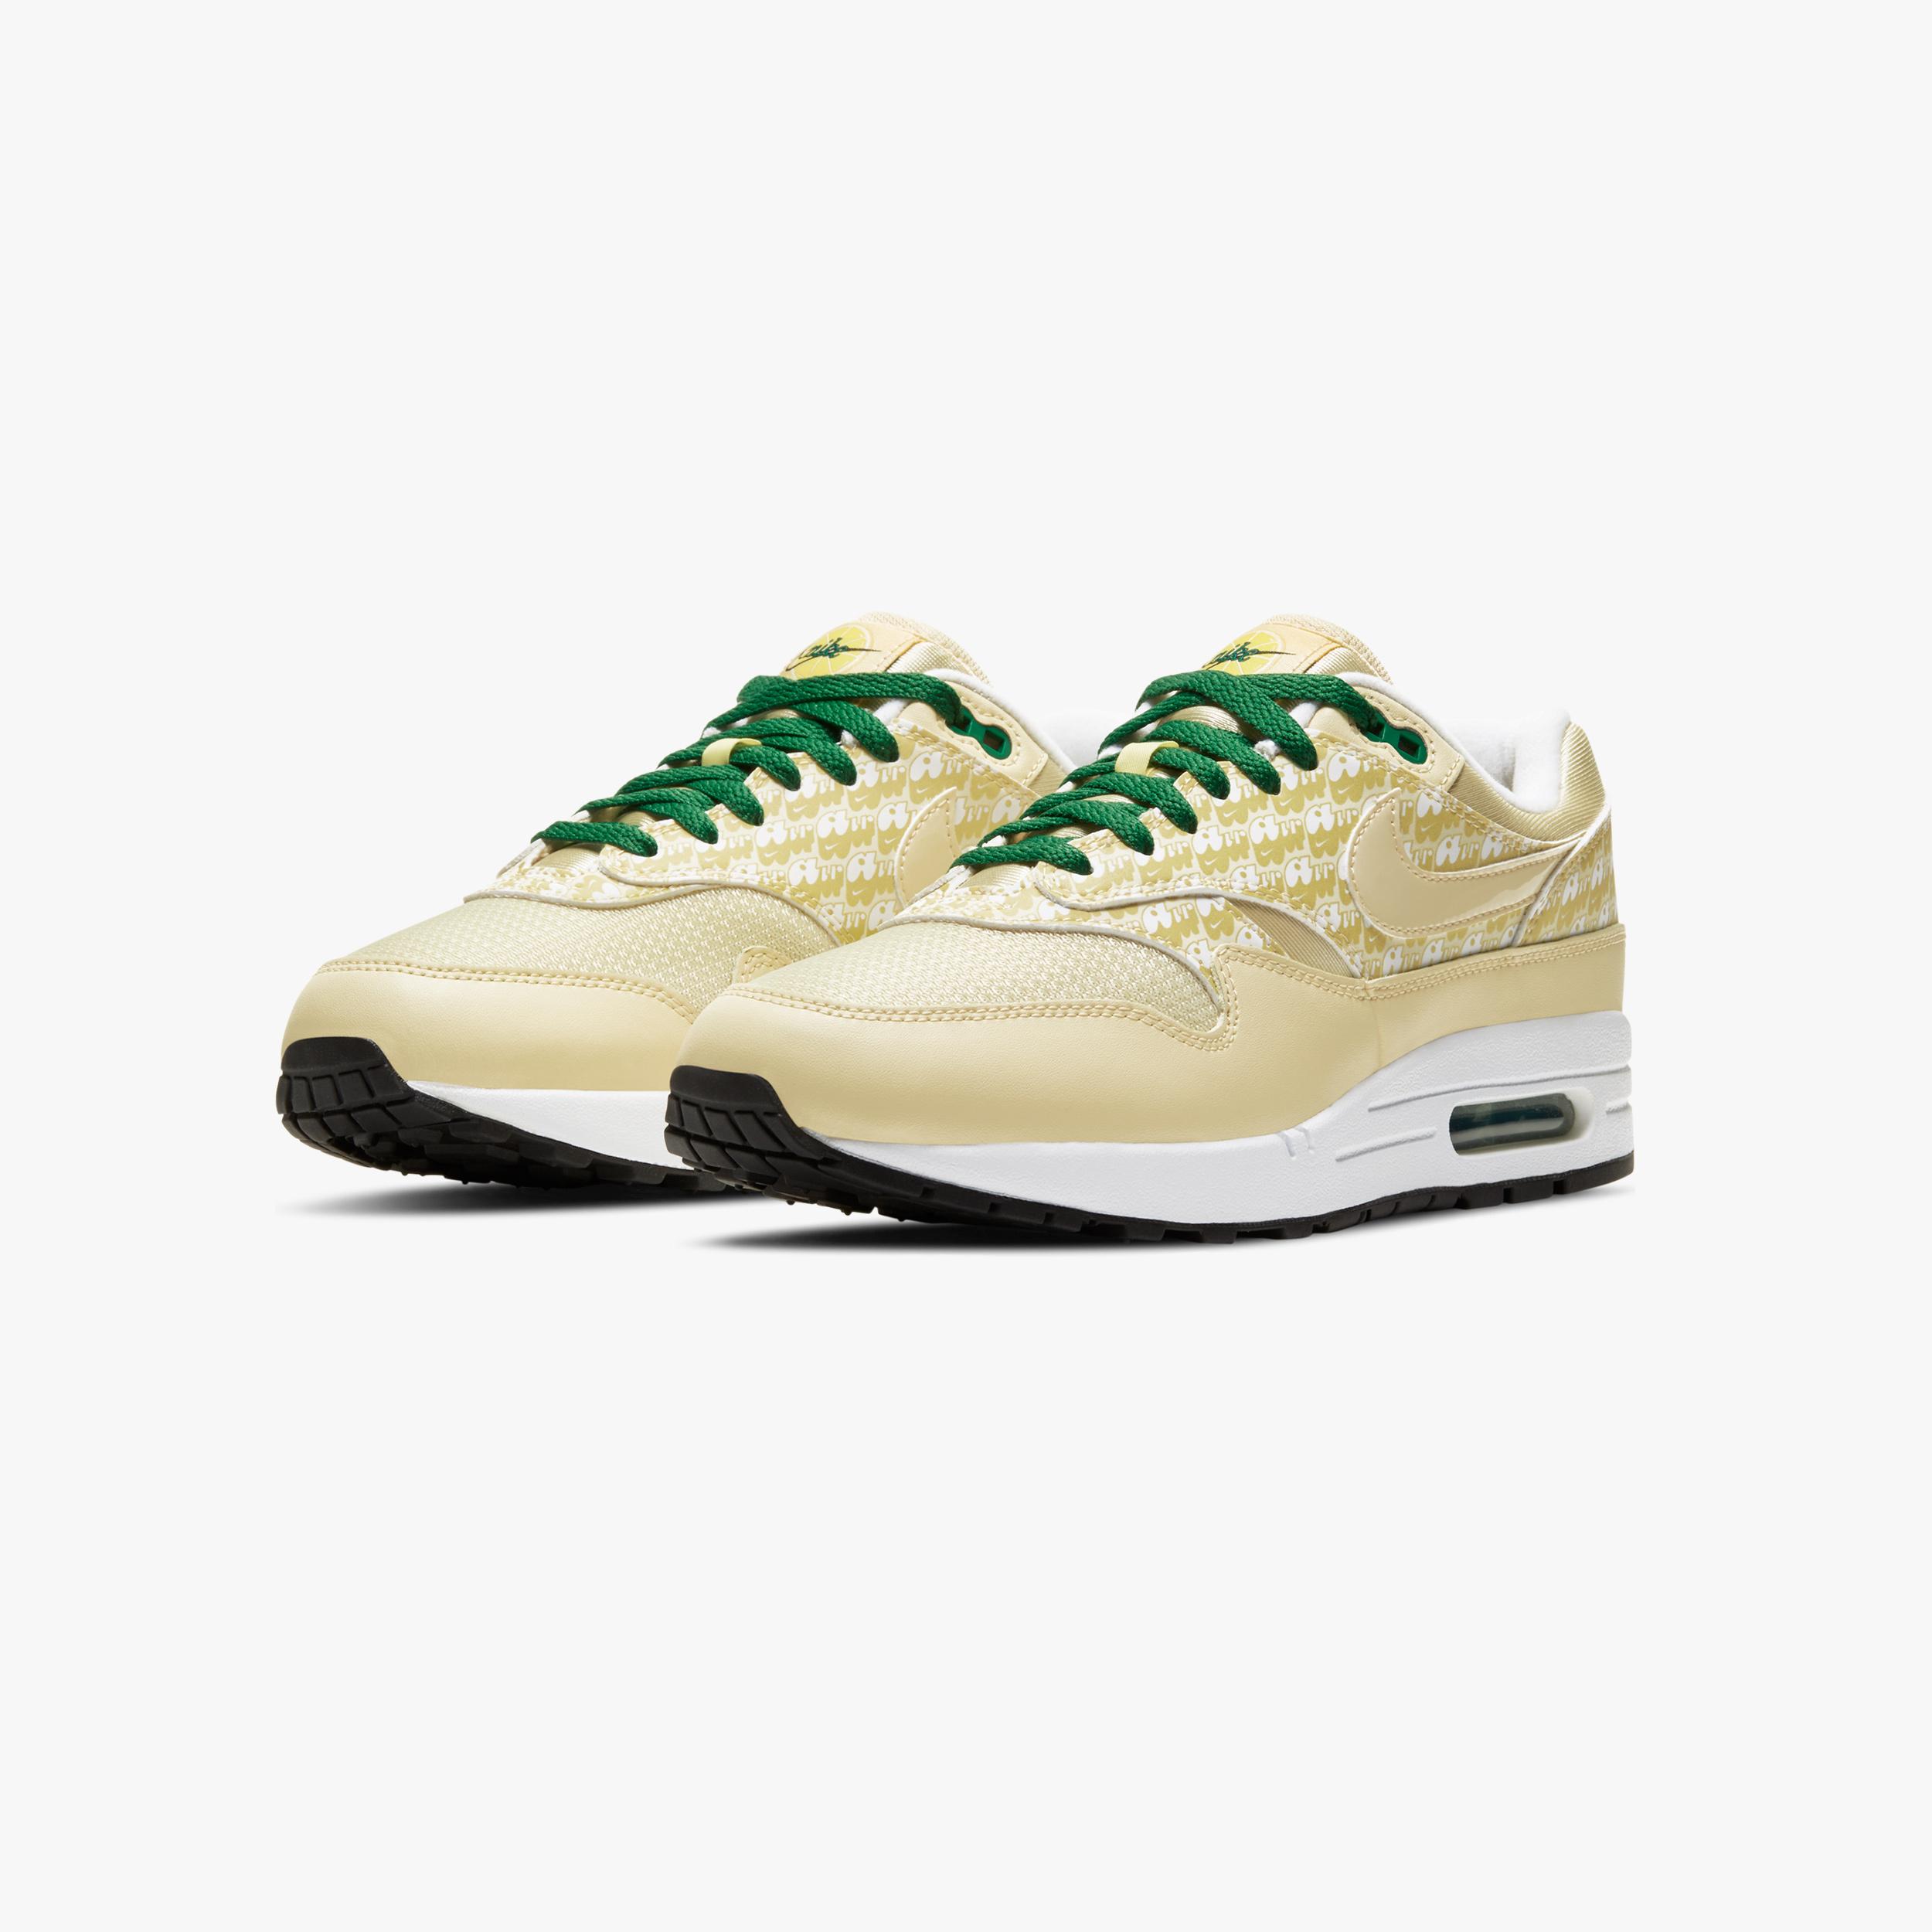 Nike Air Max 1 Prm - Cj0609-700 - SNS | sneakers & streetwear ...